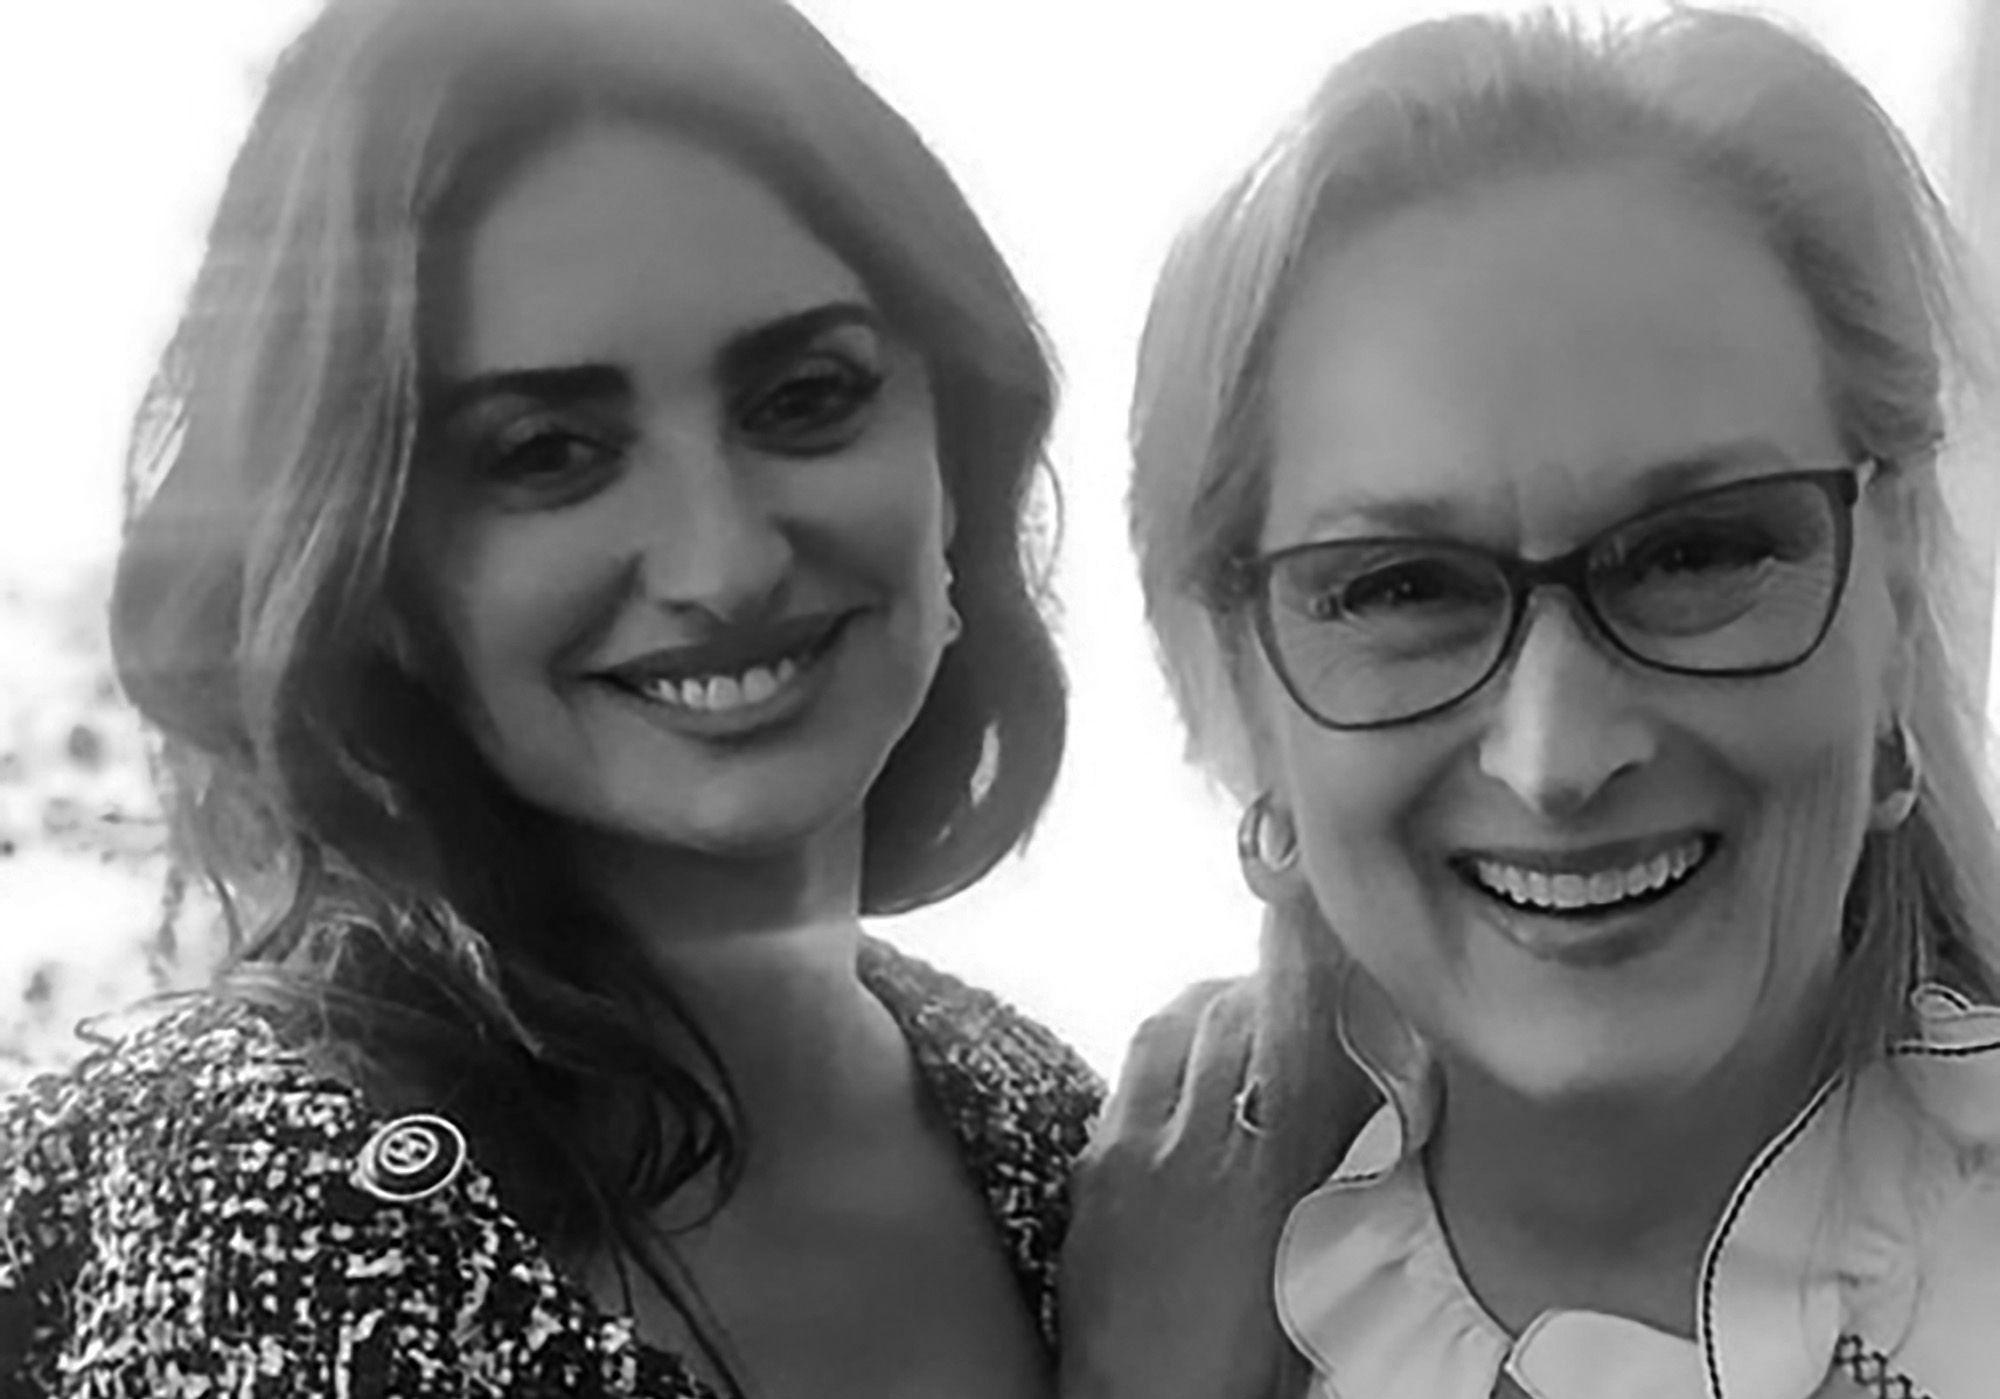 Penelope Cruz Calls Meryl Streep Goddess At Festival